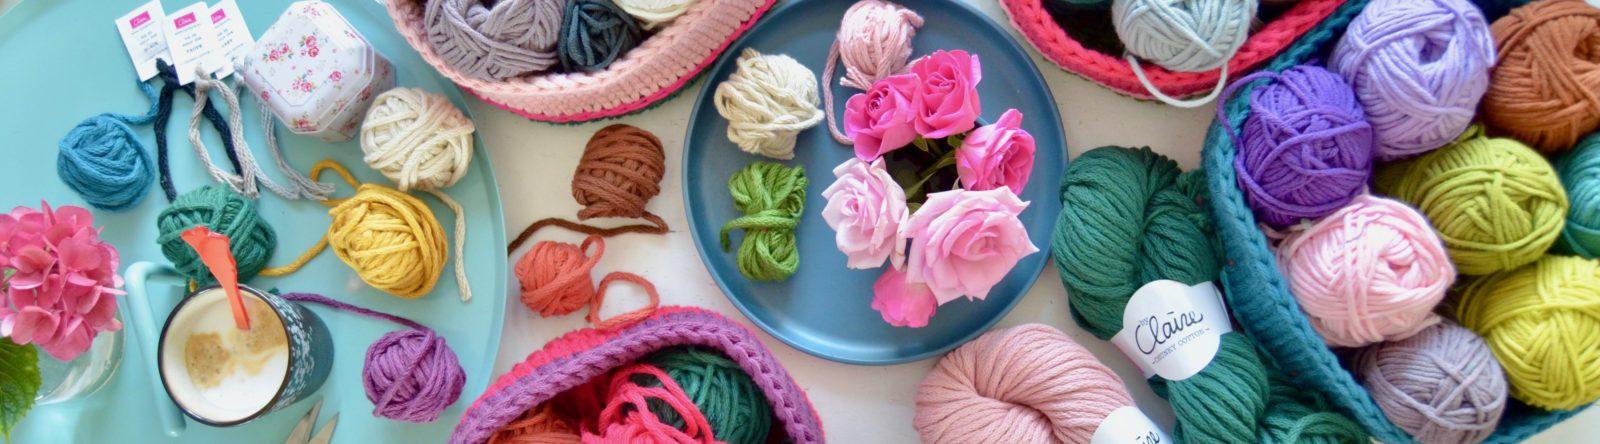 byClaire haakgaren chunku cotton